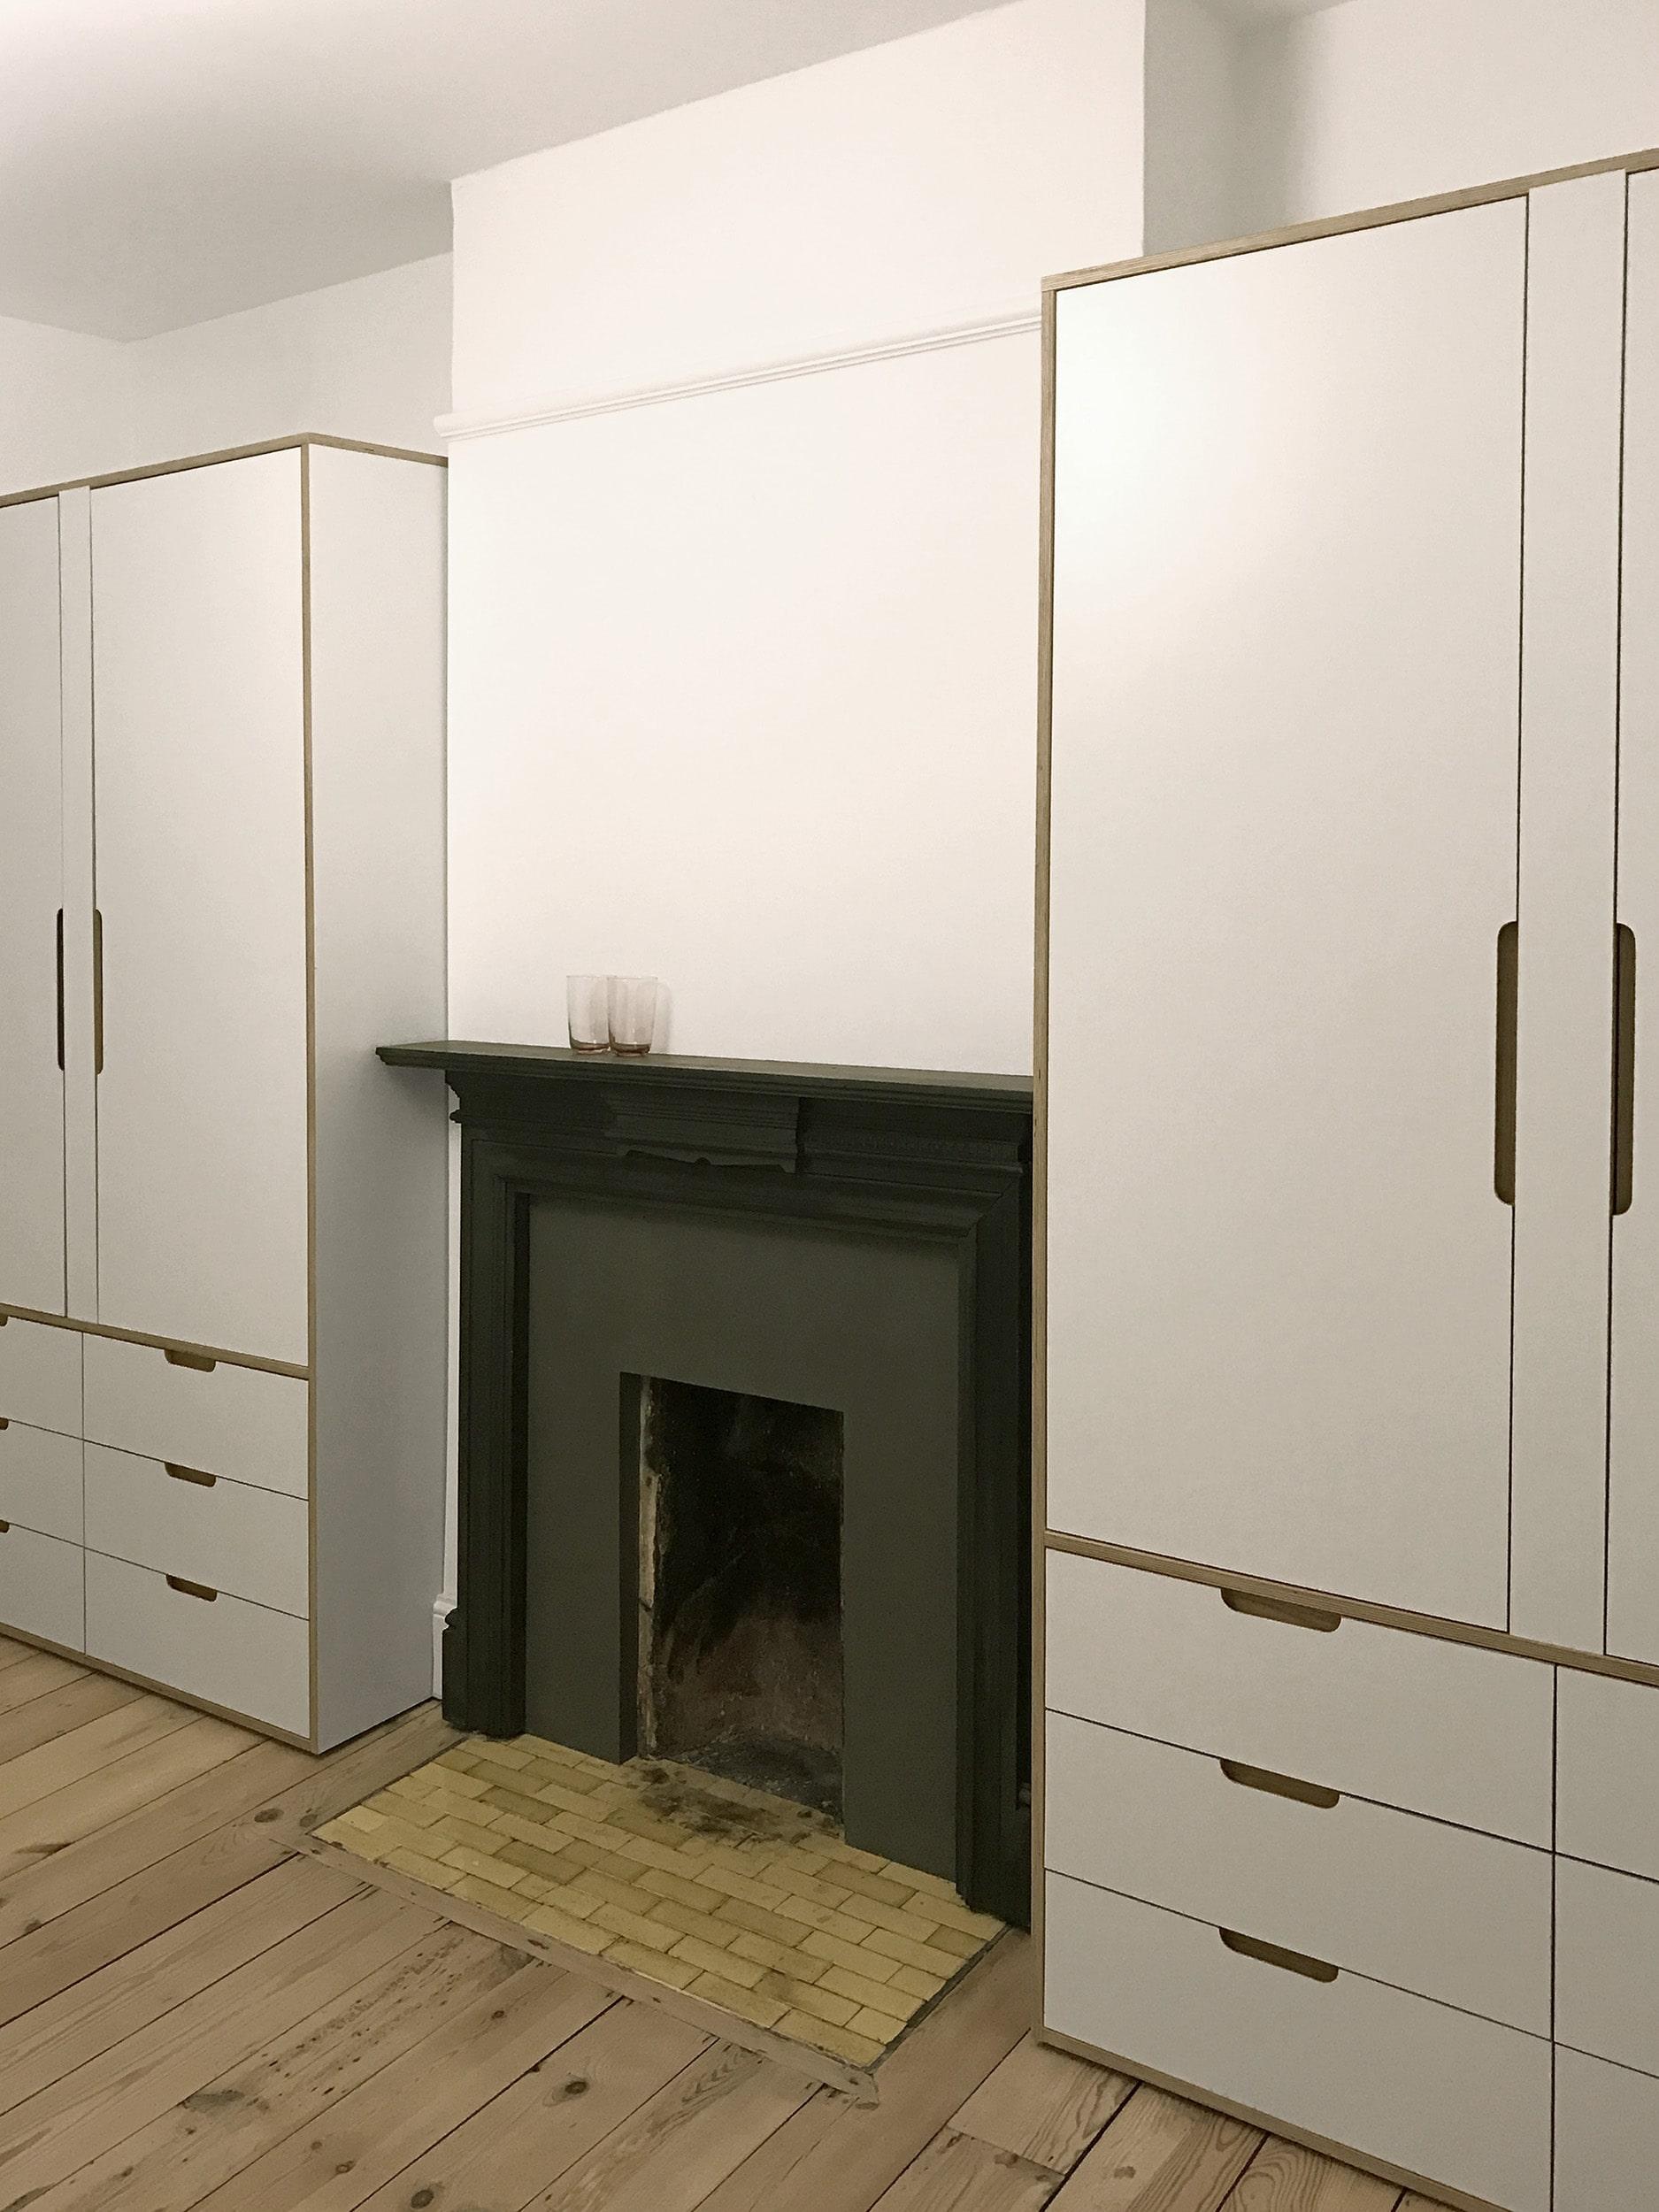 Vilma's minimal bespoke plywood alcove wardrobe by Lozi